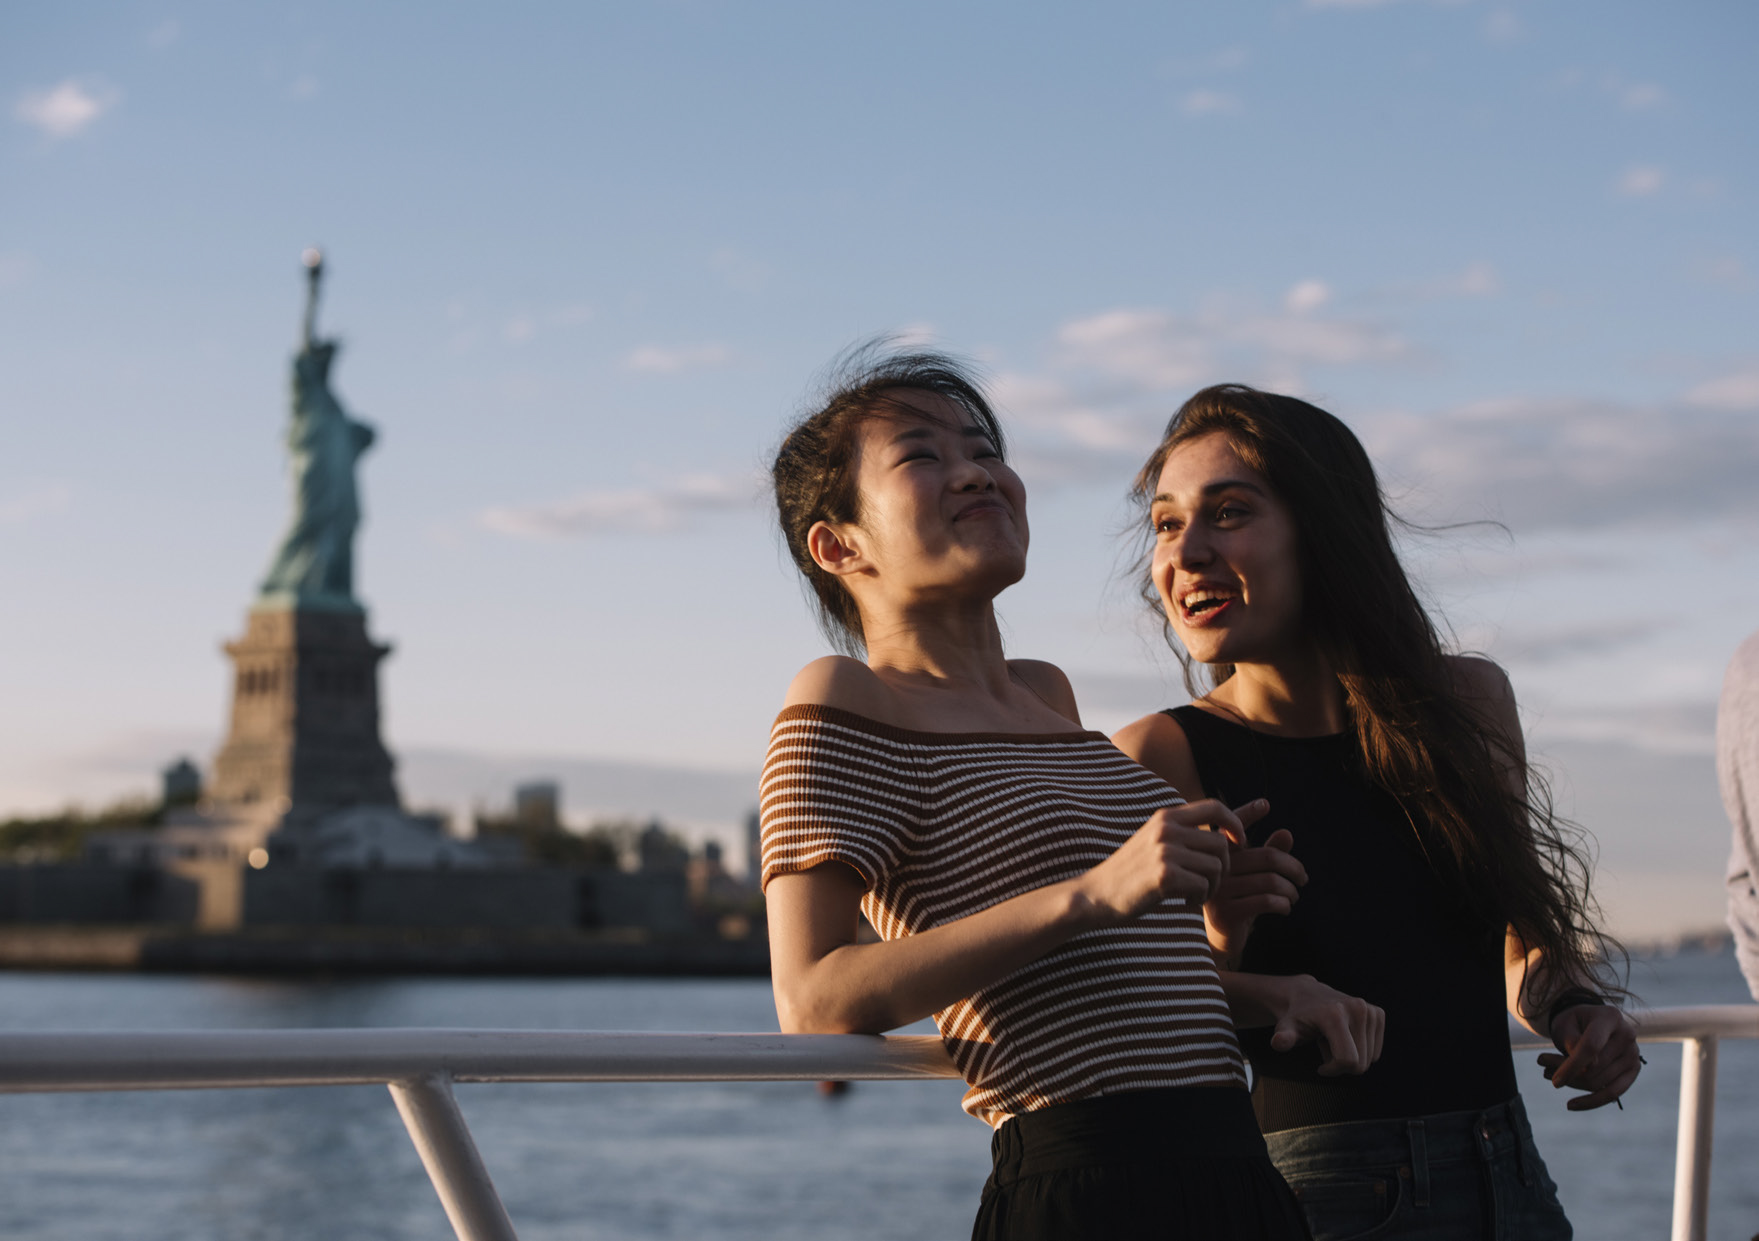 NYC_Stills_Selects_2017-15.jpg